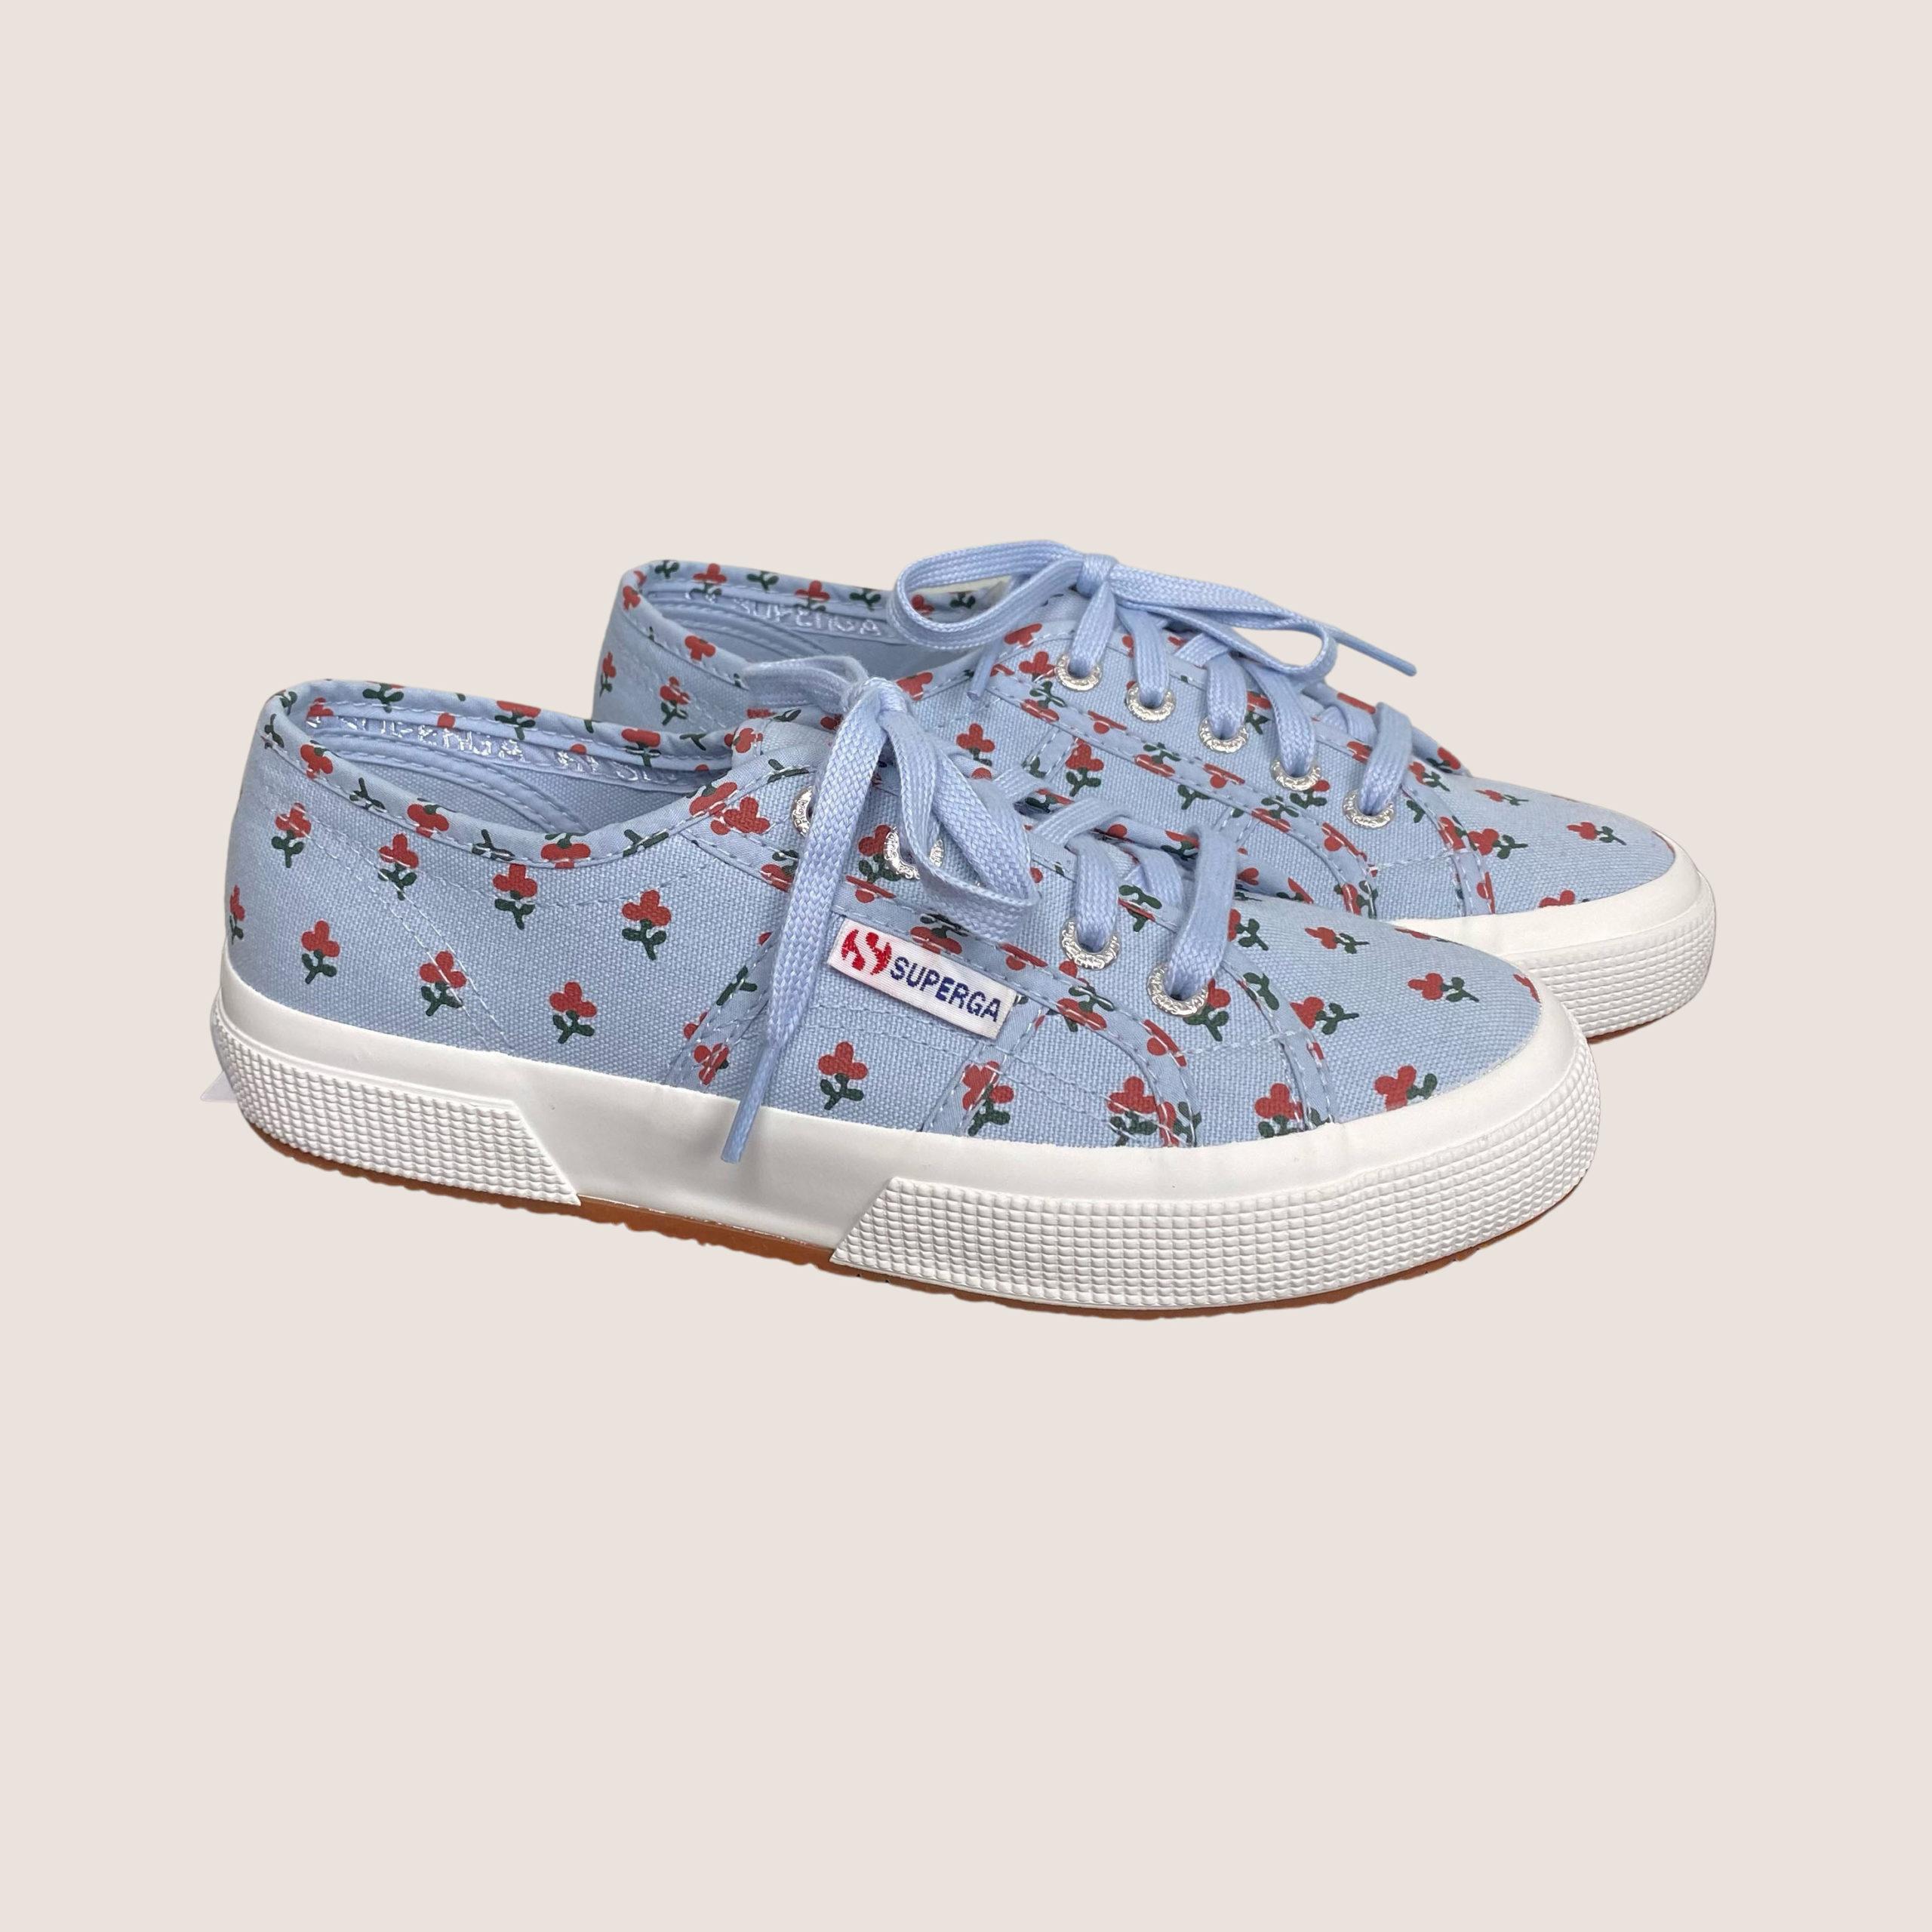 Superga x Leah Maria Sneakers